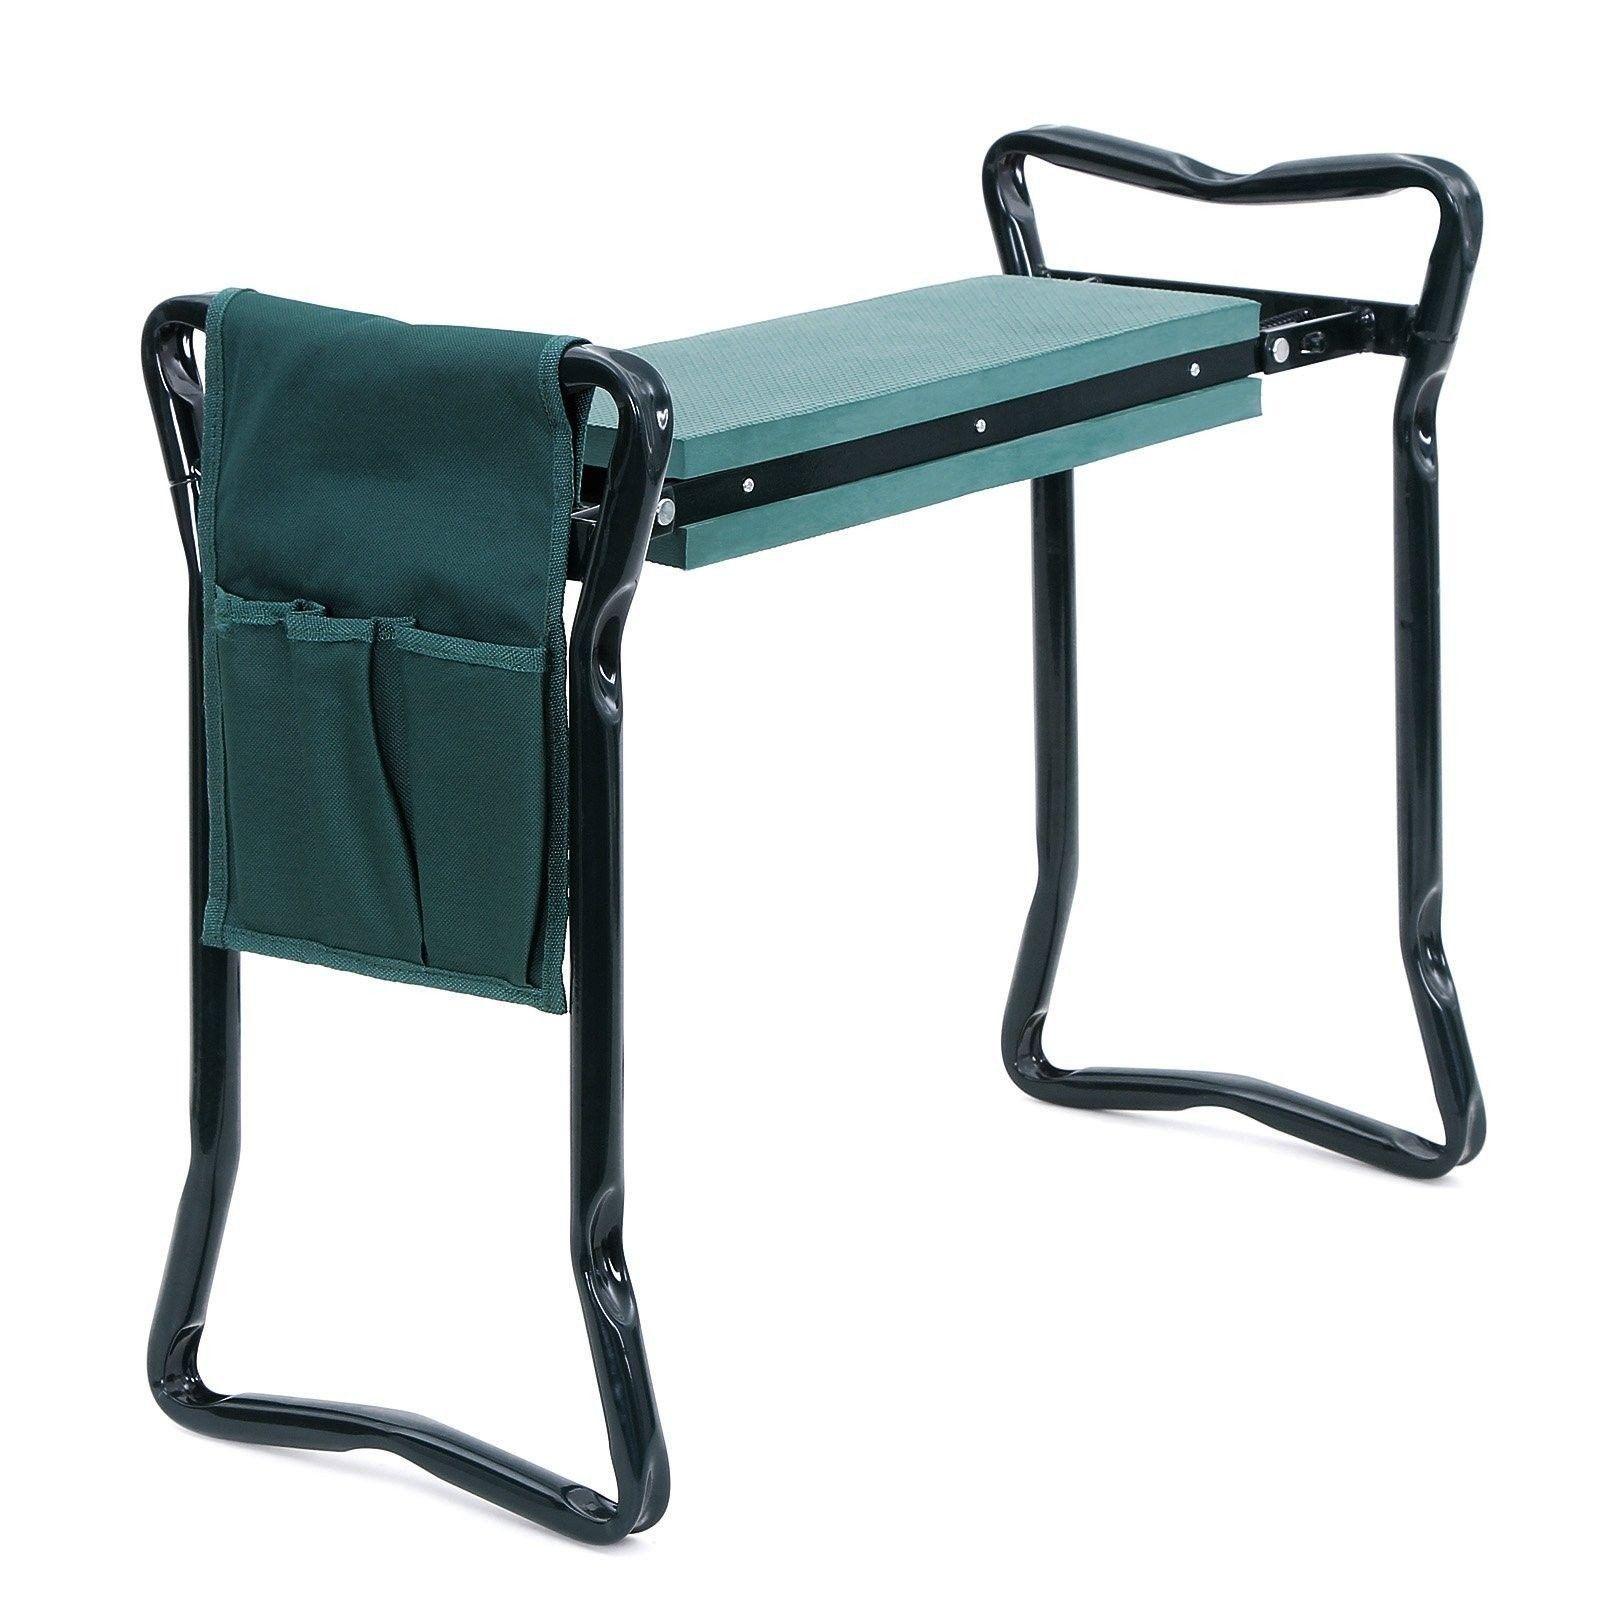 gardeners uncommongoods tool garden work gardening seat s stool product thumbnail gardener